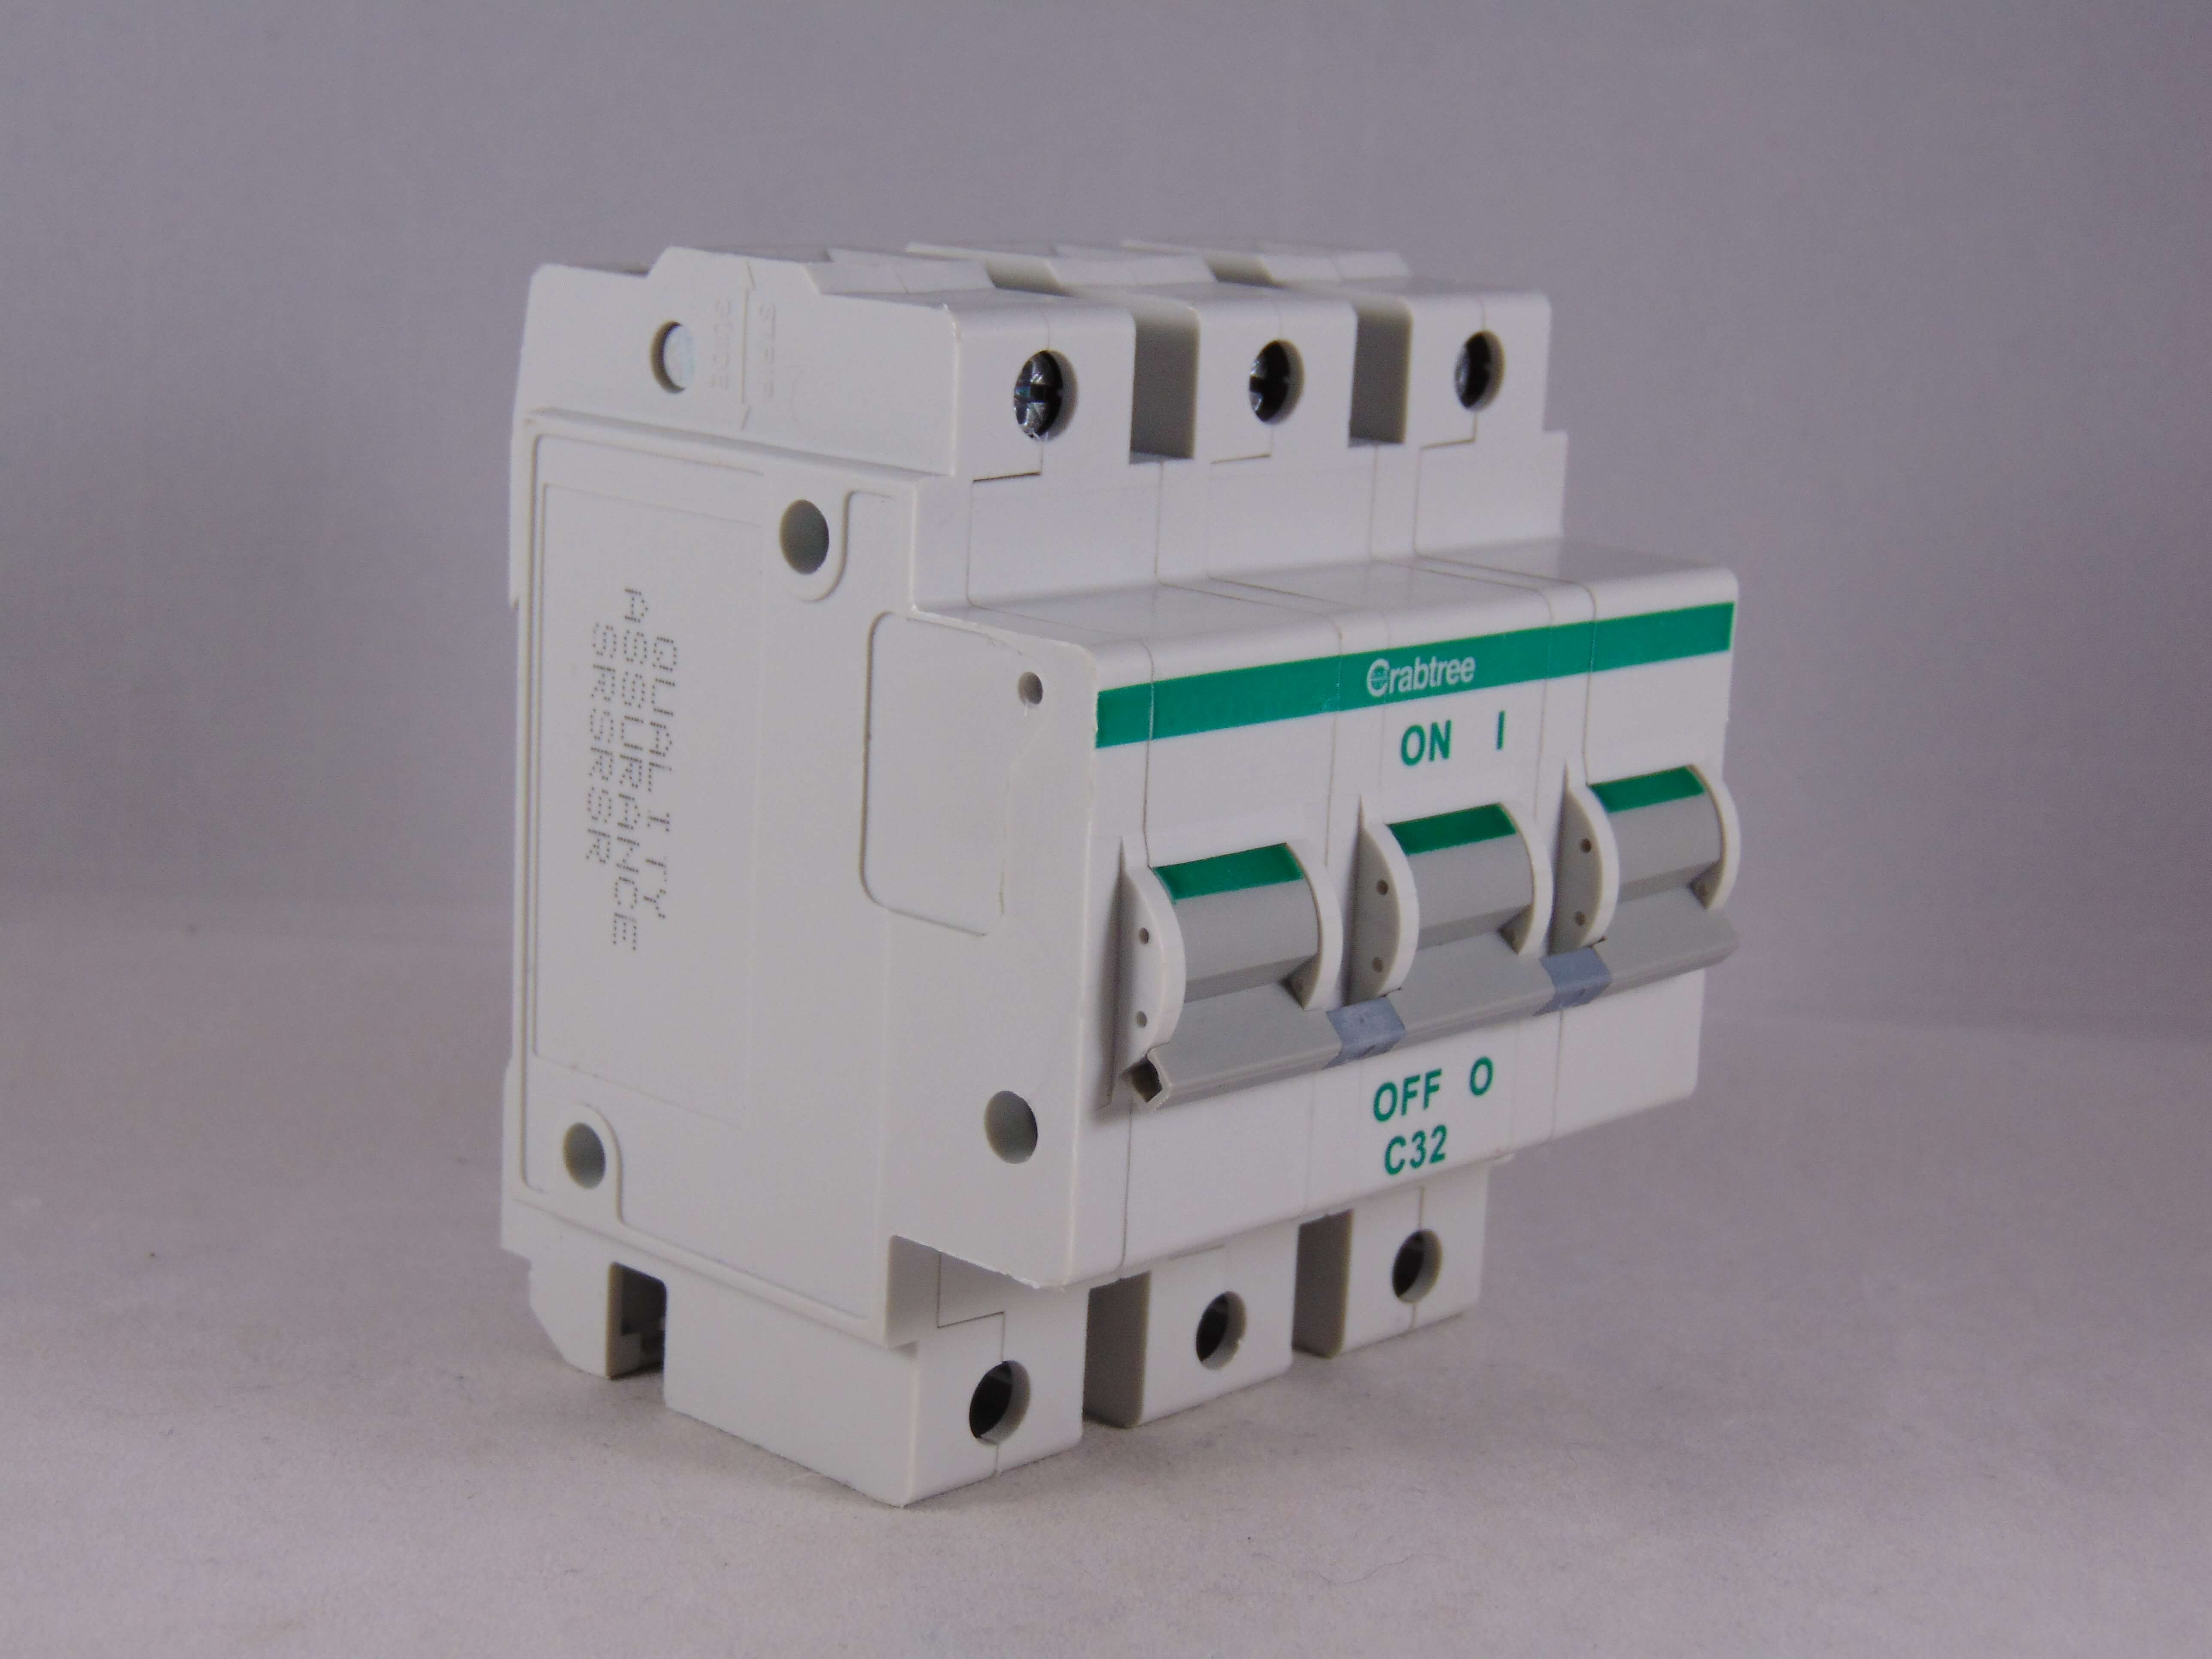 Crabtree Polestar 32 Amp Type C 30mA RCBO RCD CIRCUIT BREAKER 32A C32 602C/323 Circuit Breakers & Disconnectors Circuit Breakers